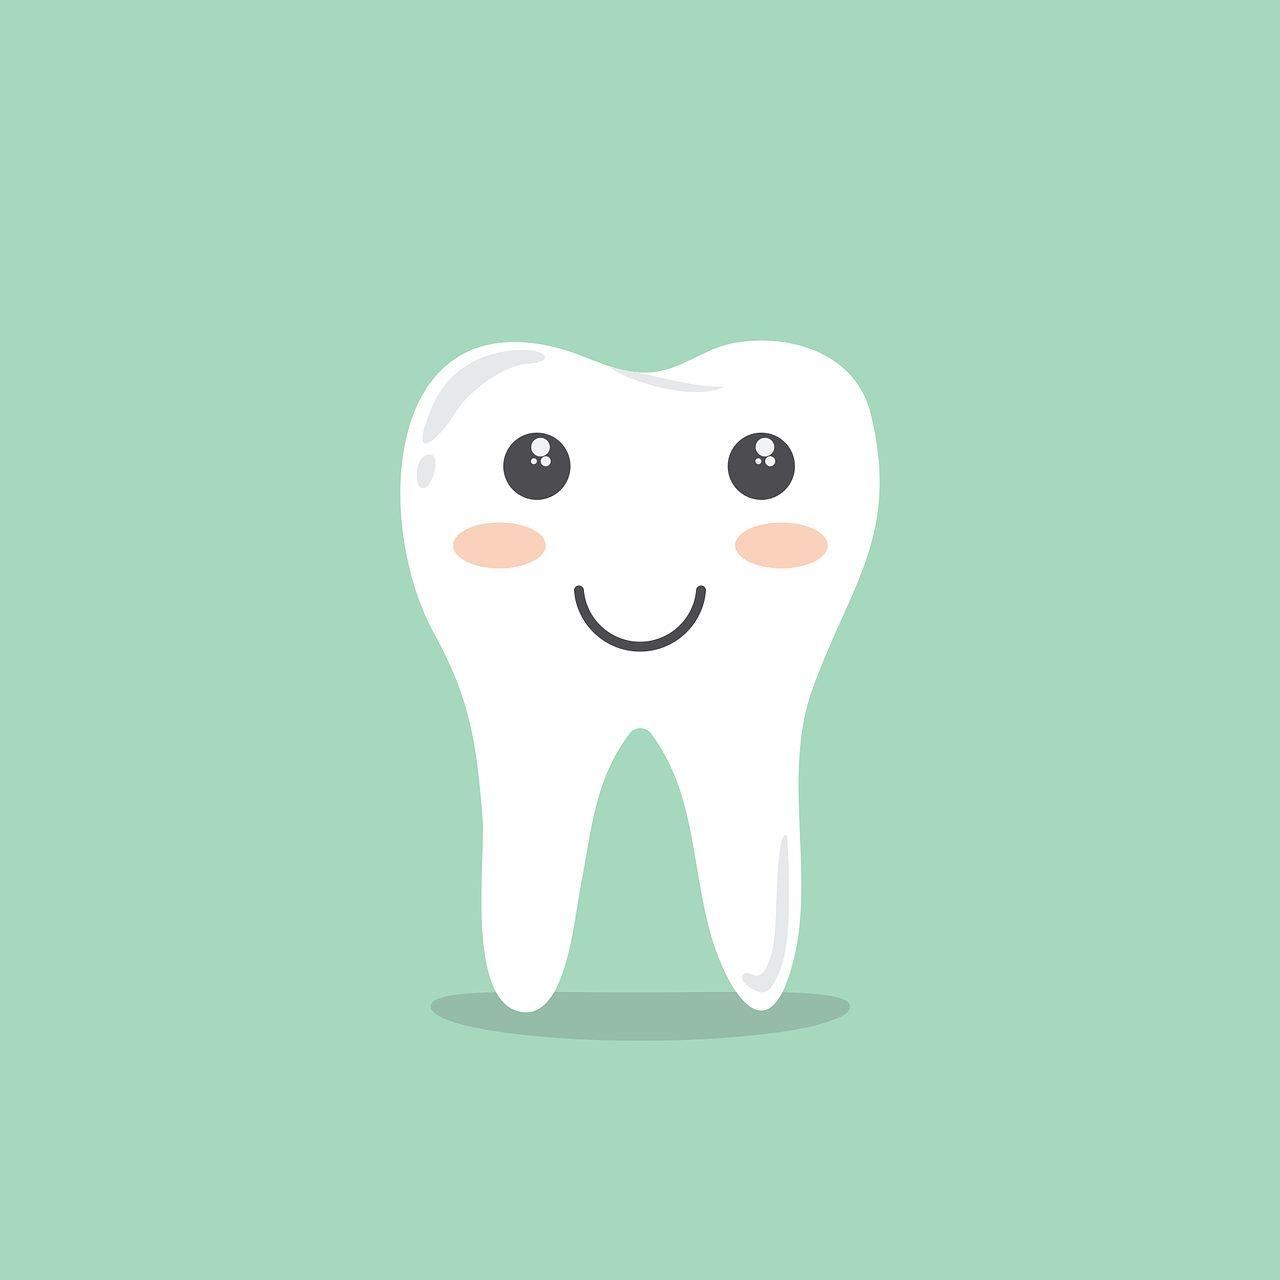 Donker Borghouts Tandartsenpraktijk spoedhulp tandarts